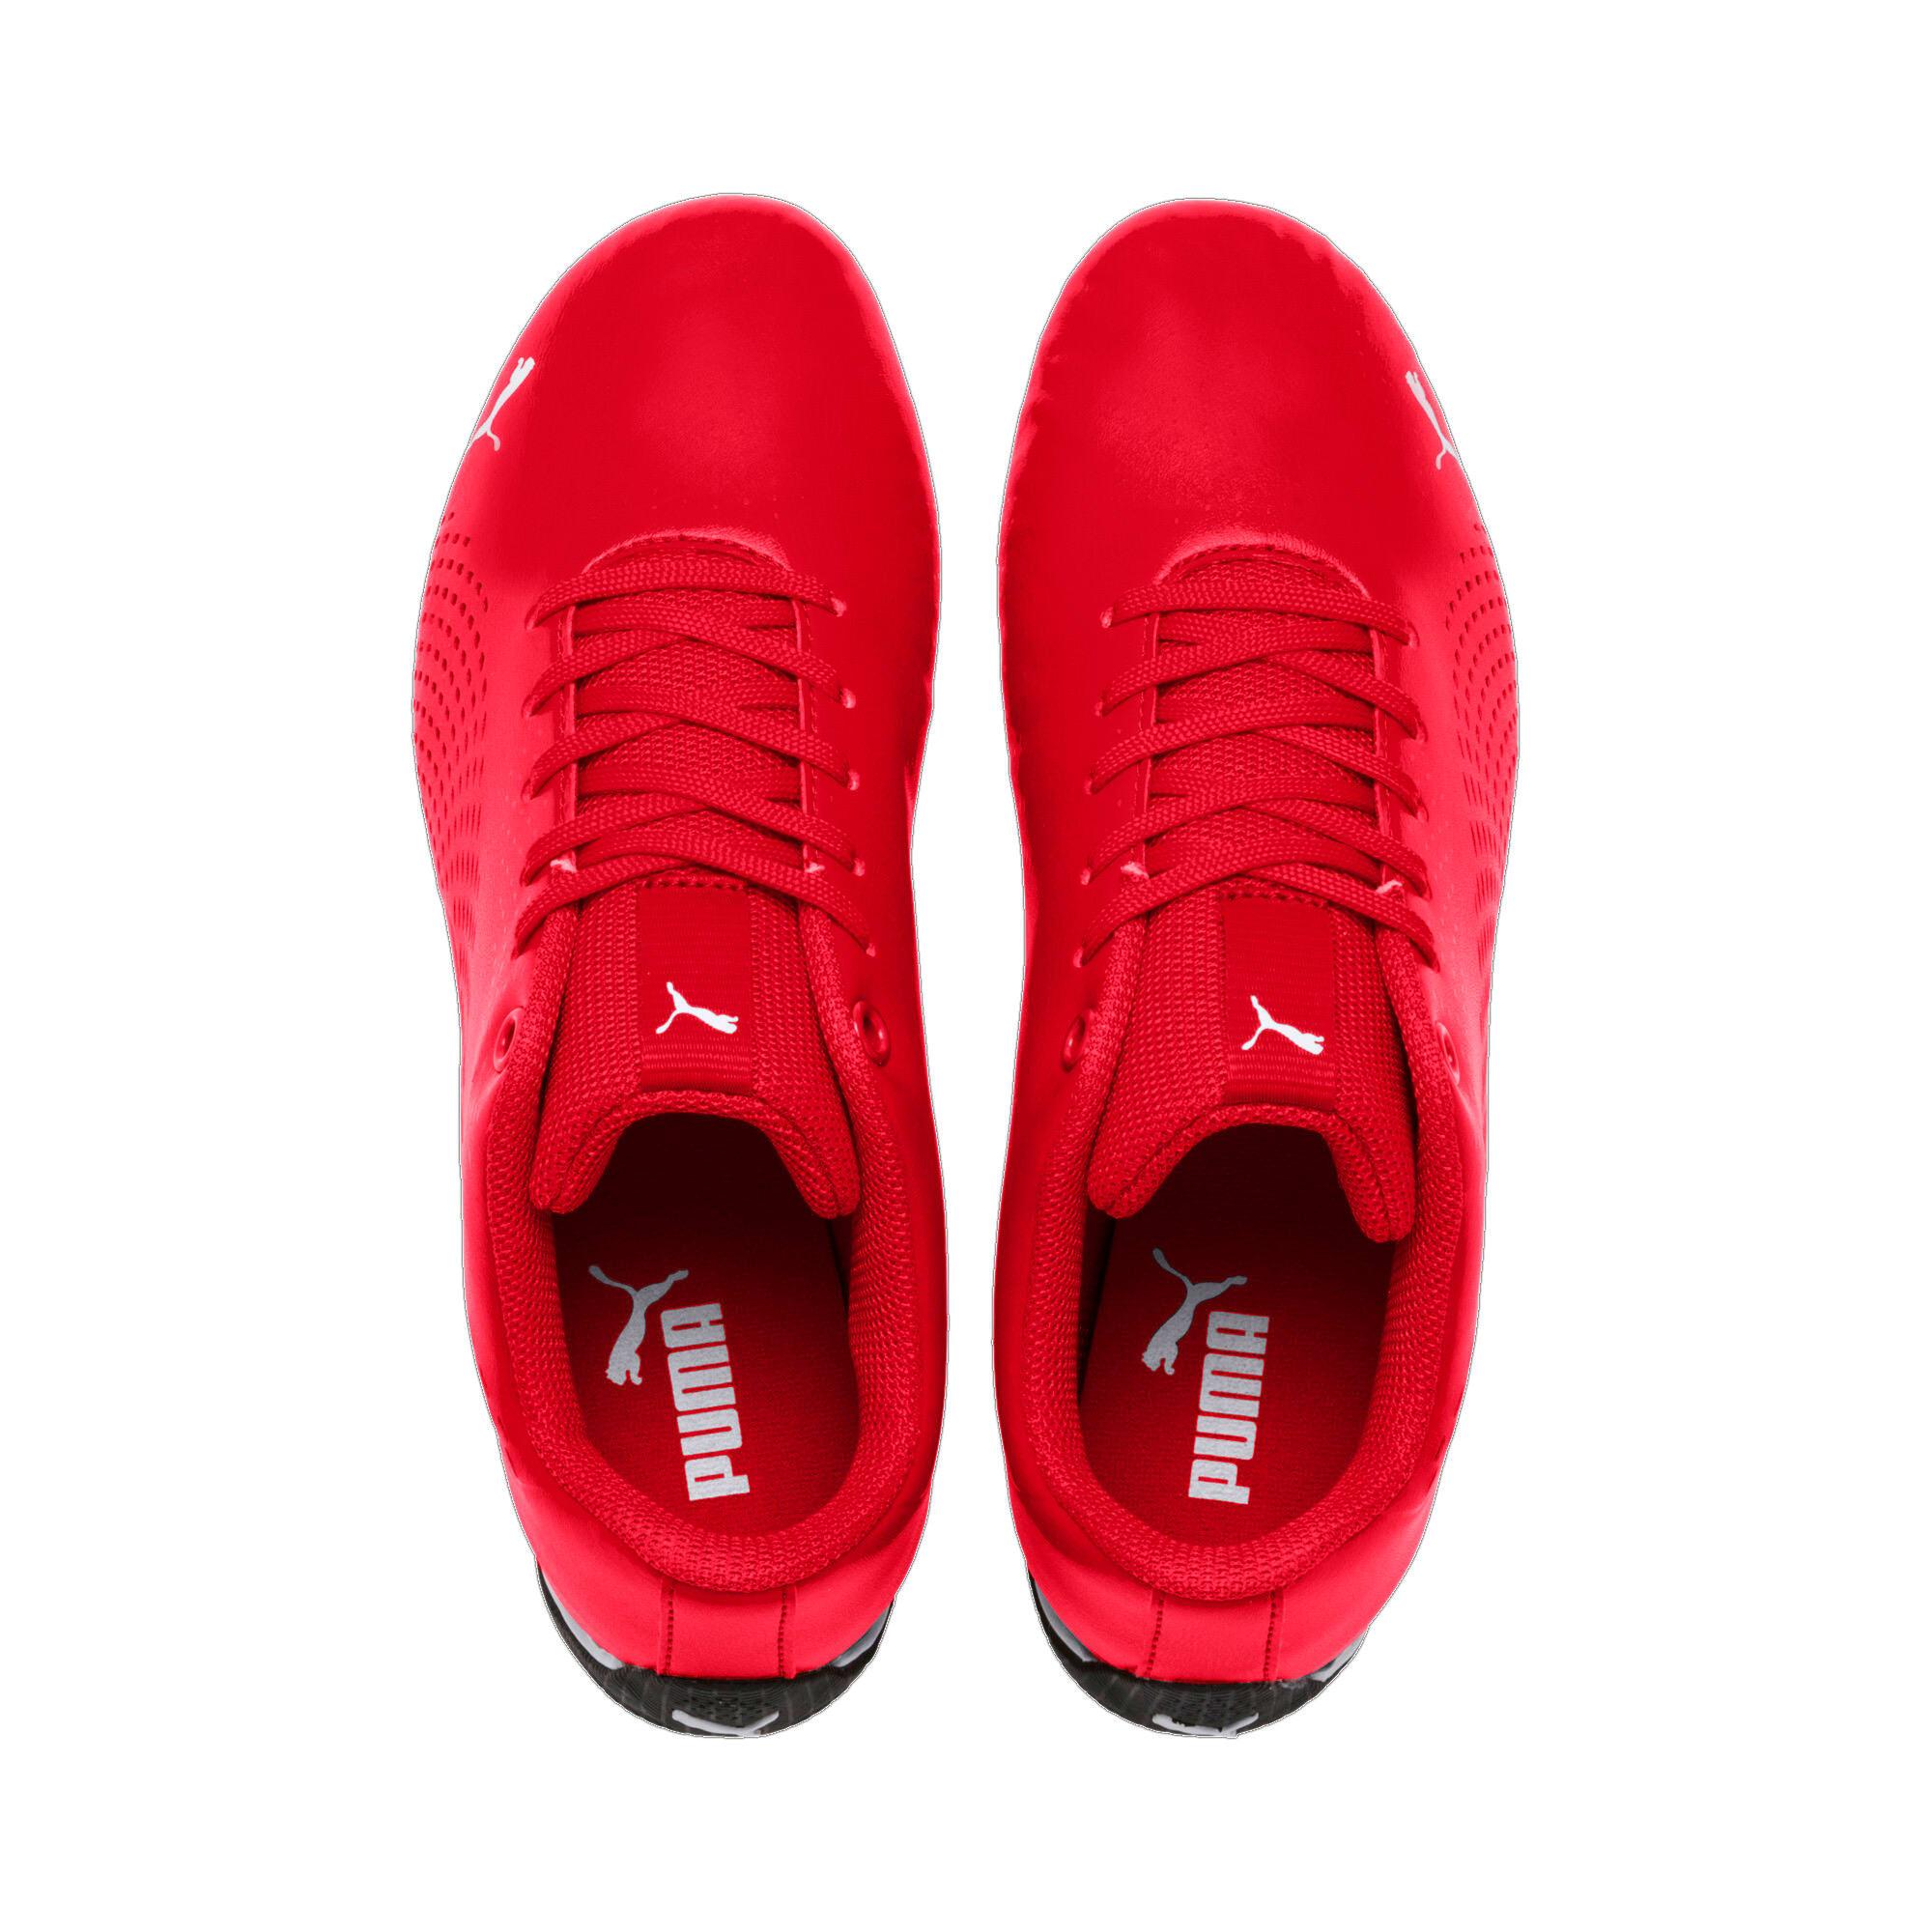 Thumbnail 6 of Scuderia Ferrari Drift Cat 5 Ultra II Shoes JR, Rosso Corsa-Puma White, medium